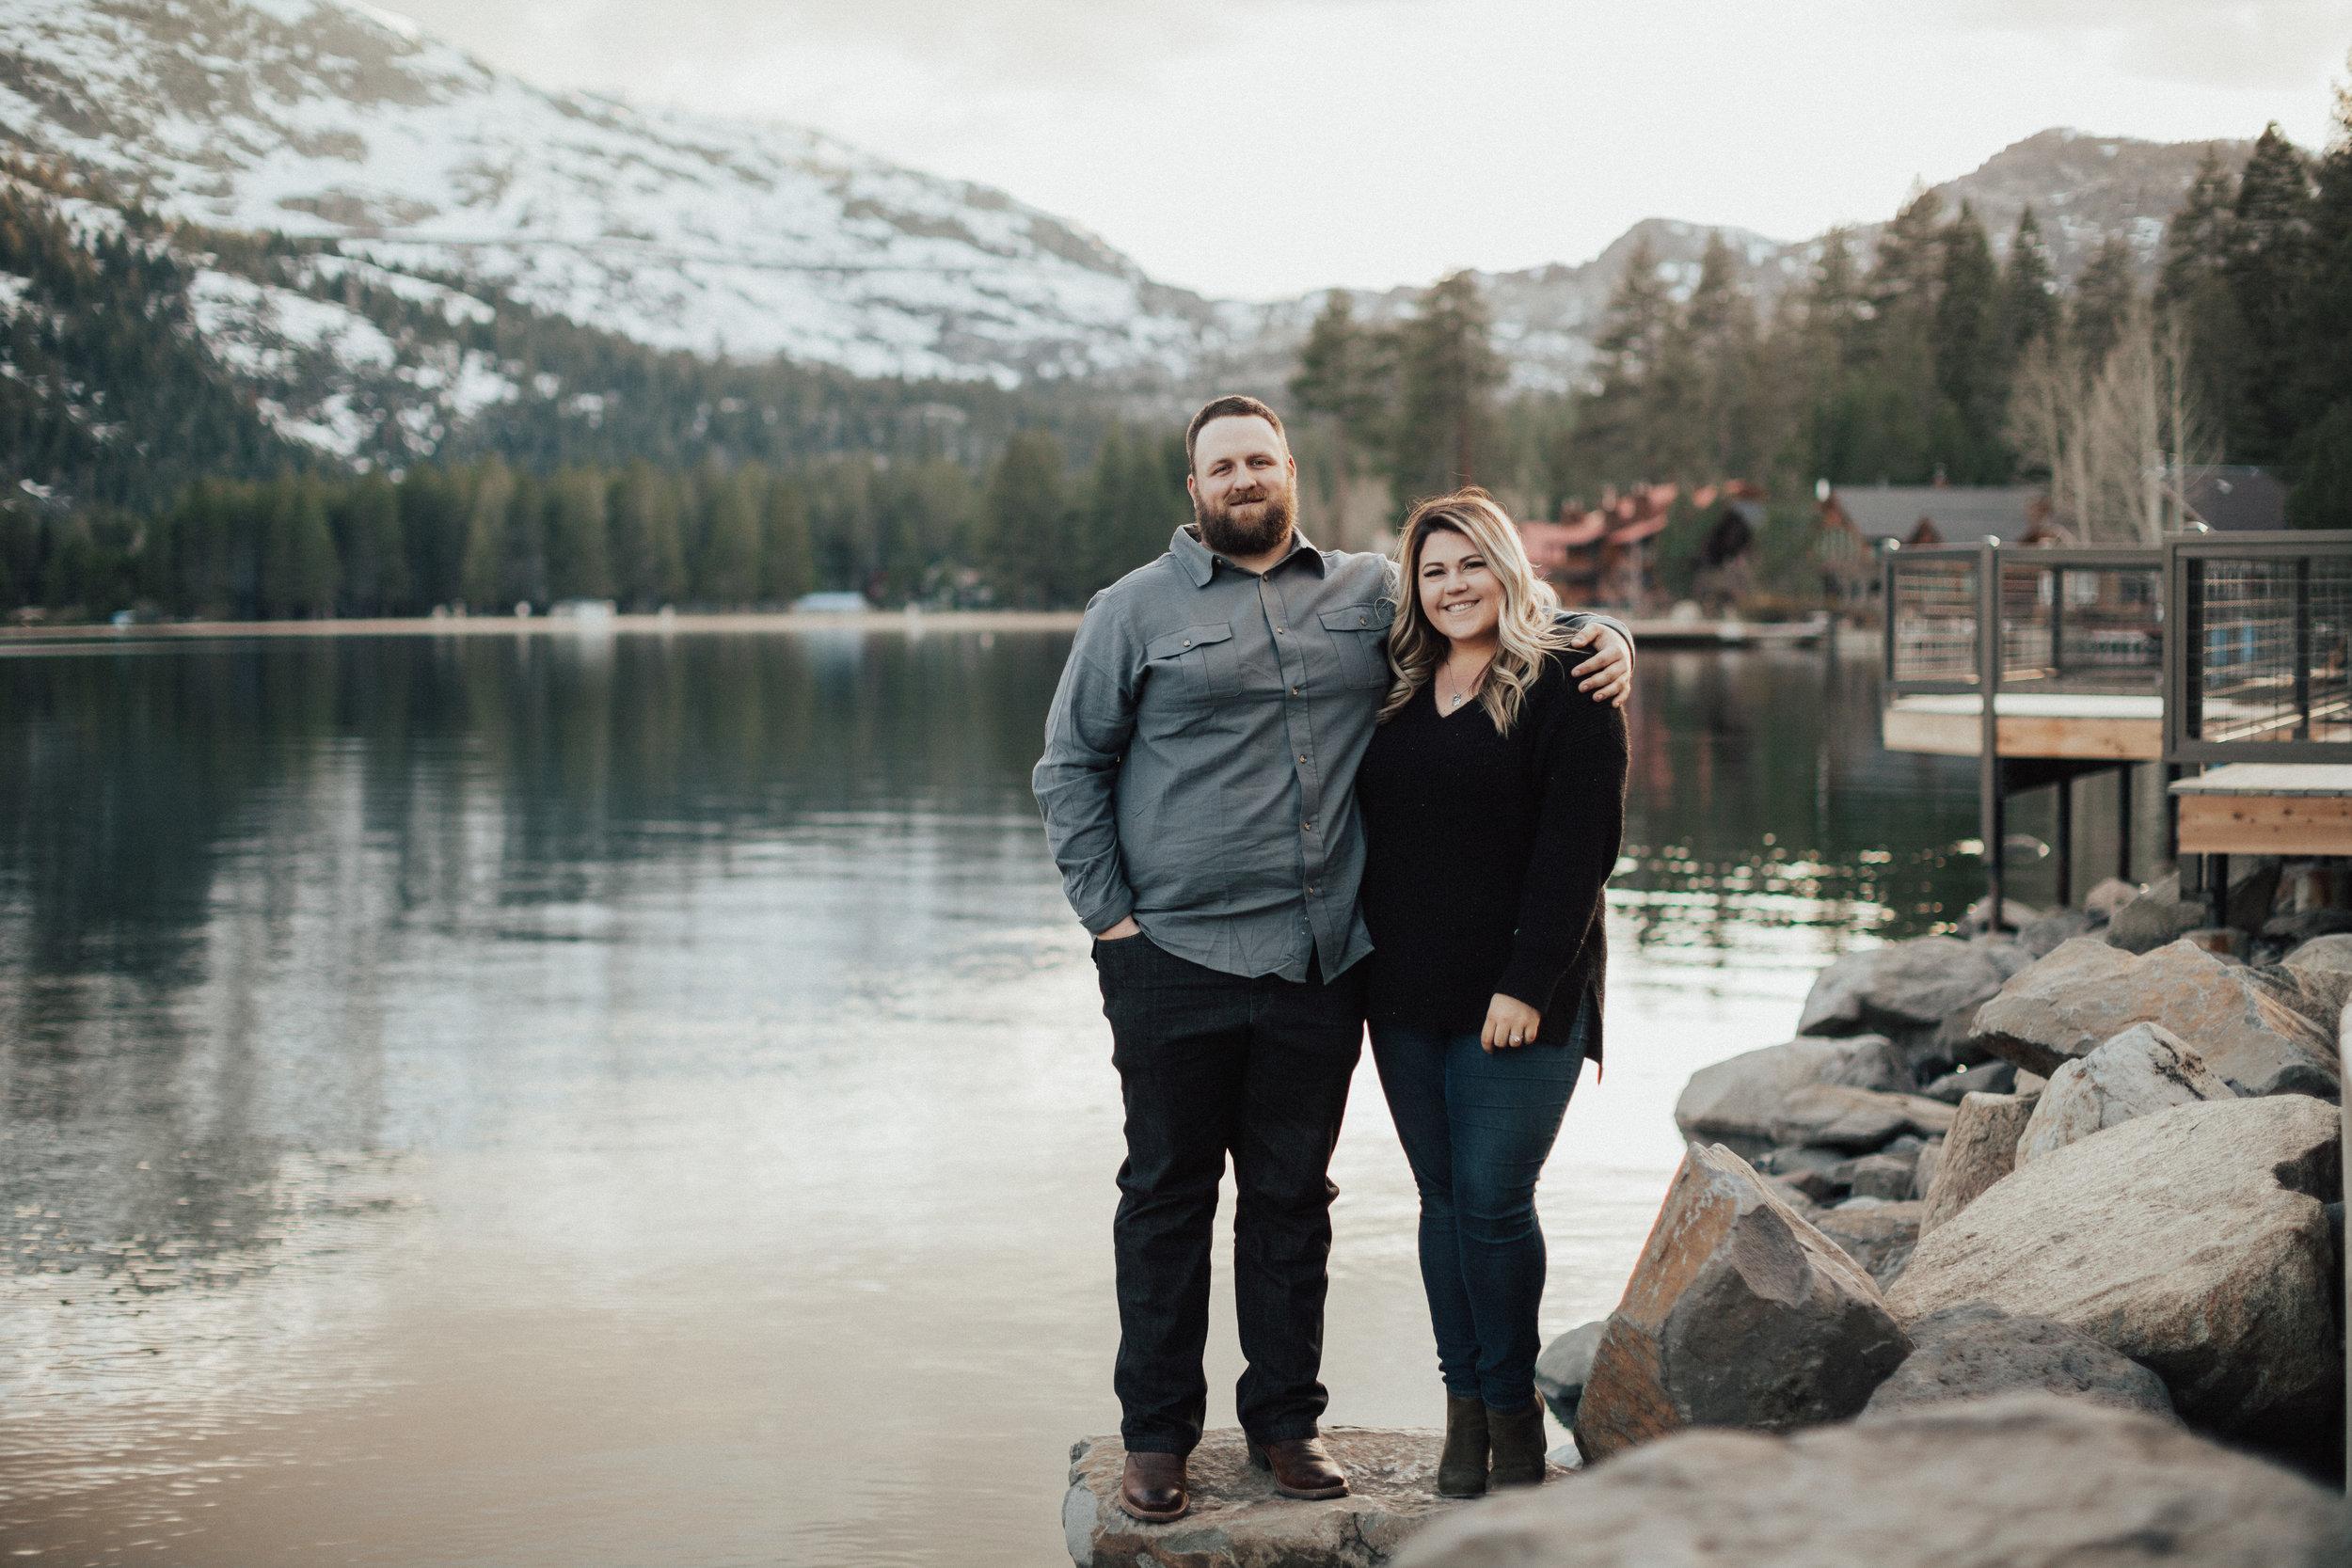 Engagement photos at Donner Lake, CA.